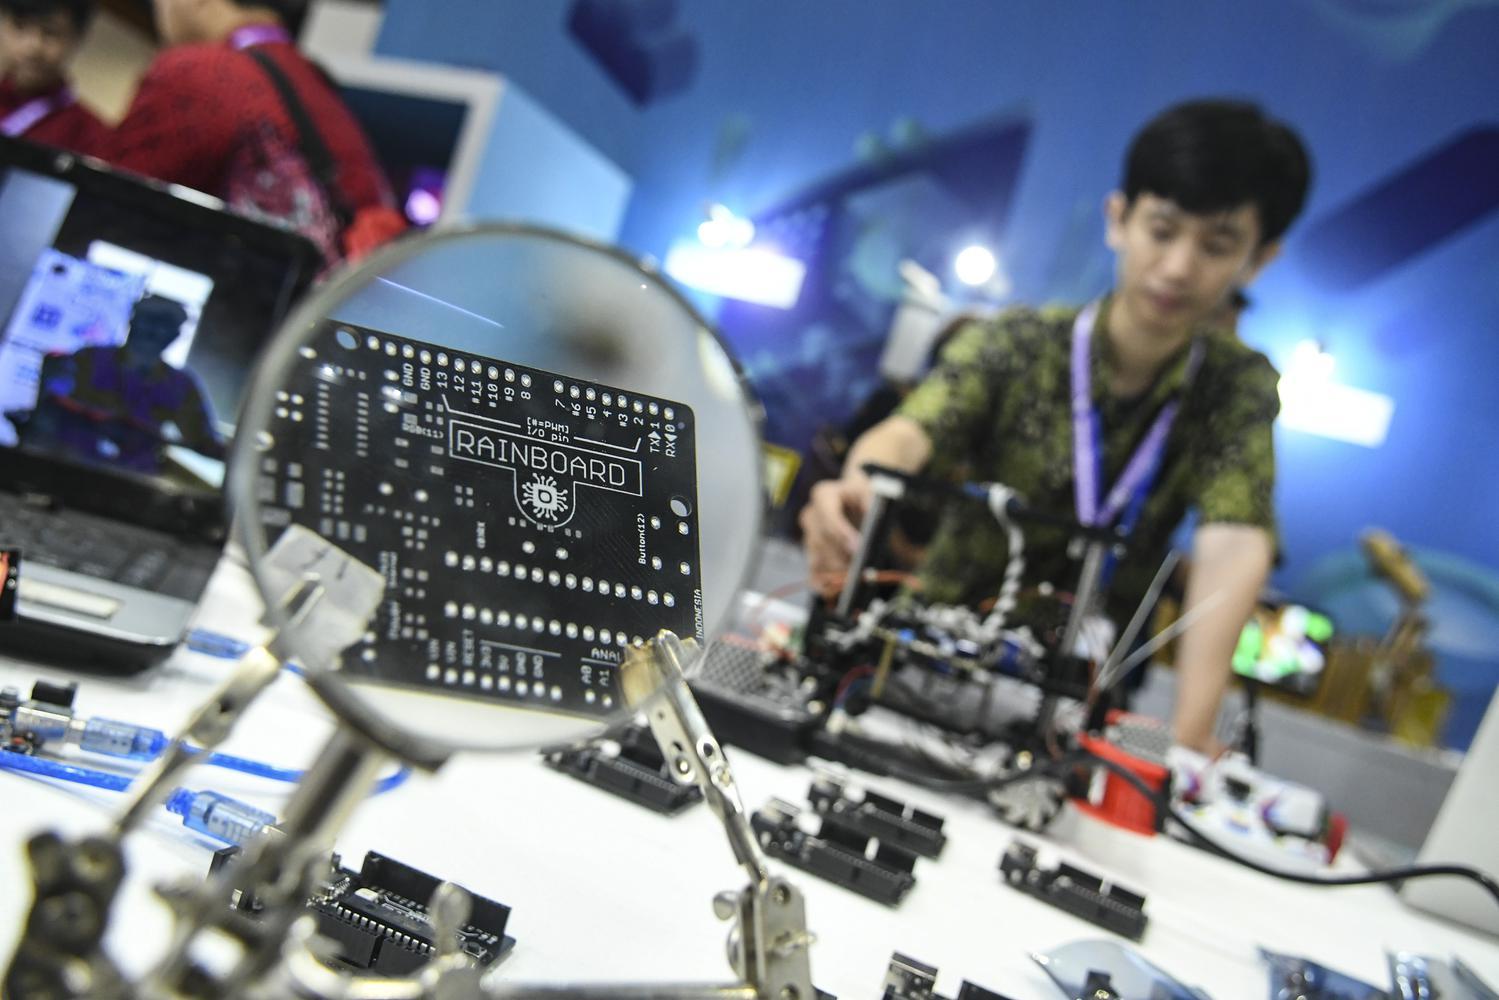 Riset: Porsi Talenta Digital 19%, RI Butuh 110 Juta Ahli pada 2025